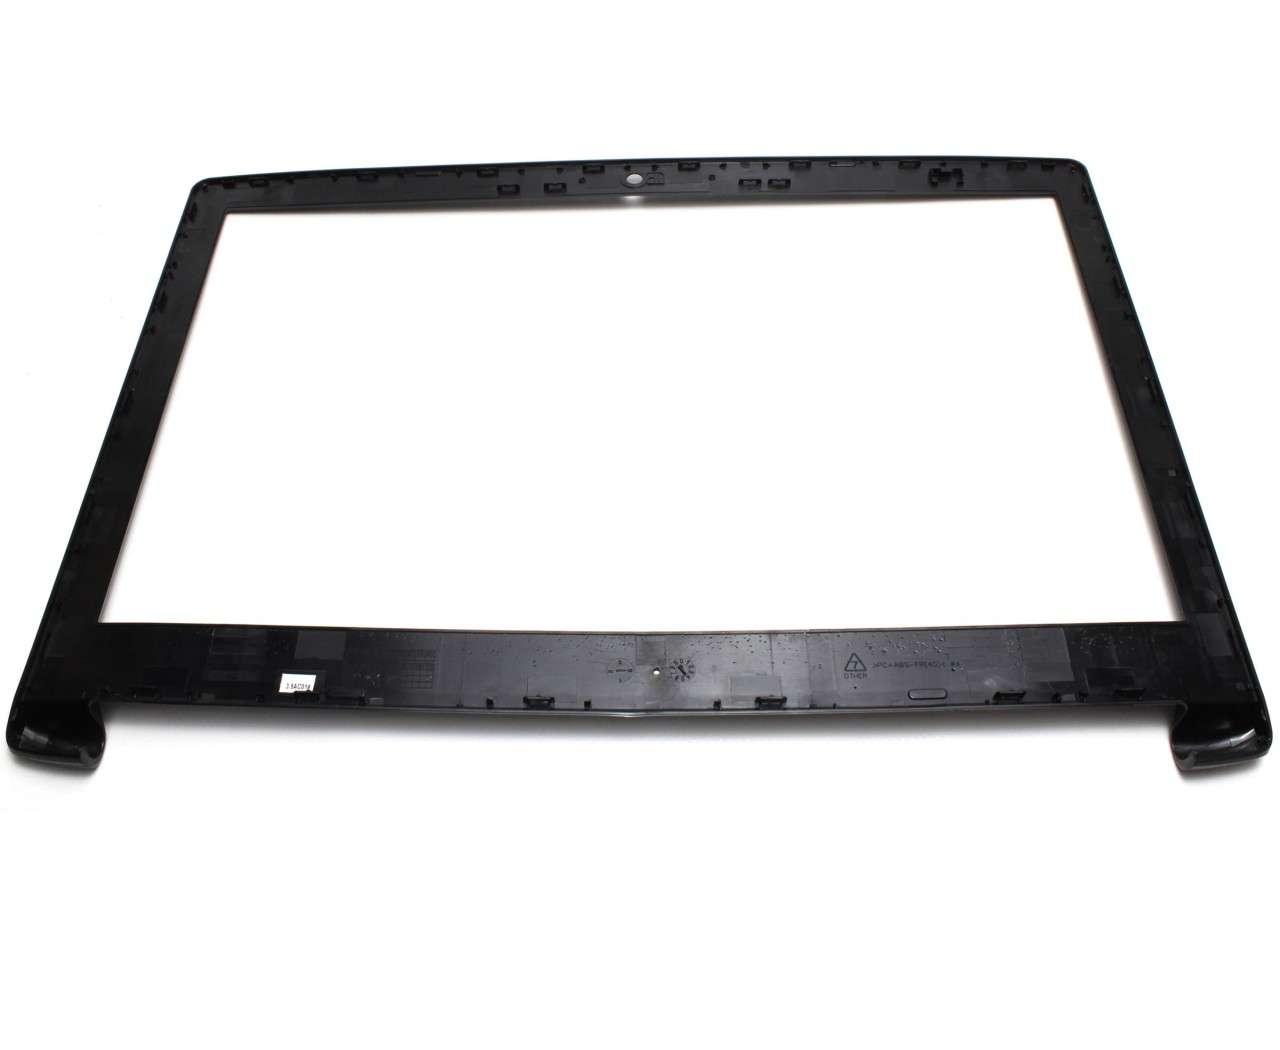 Rama Display Acer Aspire A515-51 Bezel Front Cover Neagra imagine powerlaptop.ro 2021